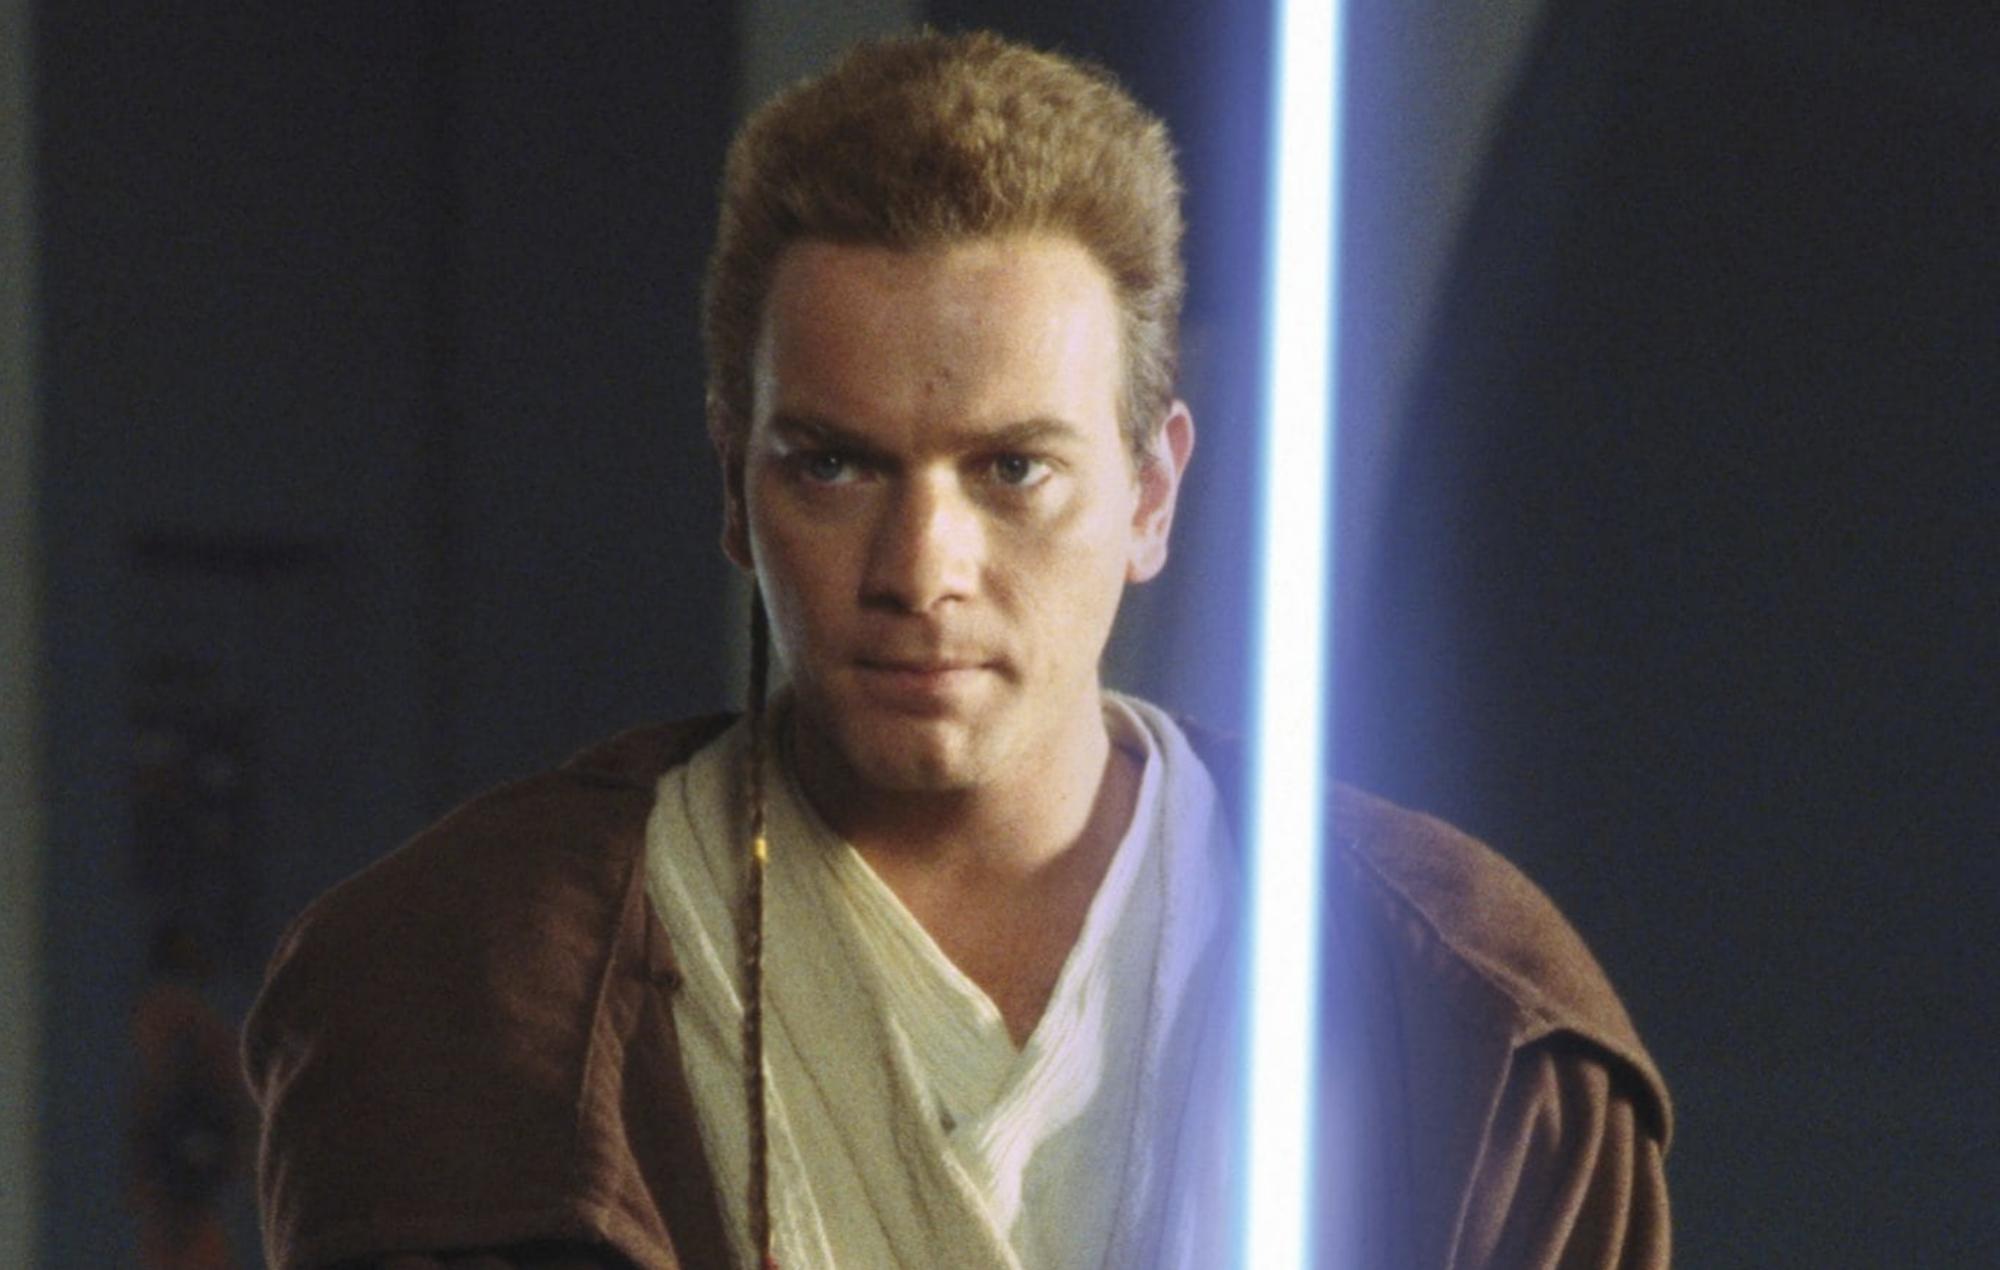 Fan pays $3,000 for Ewan McGregor's 'Star Wars' rat tail